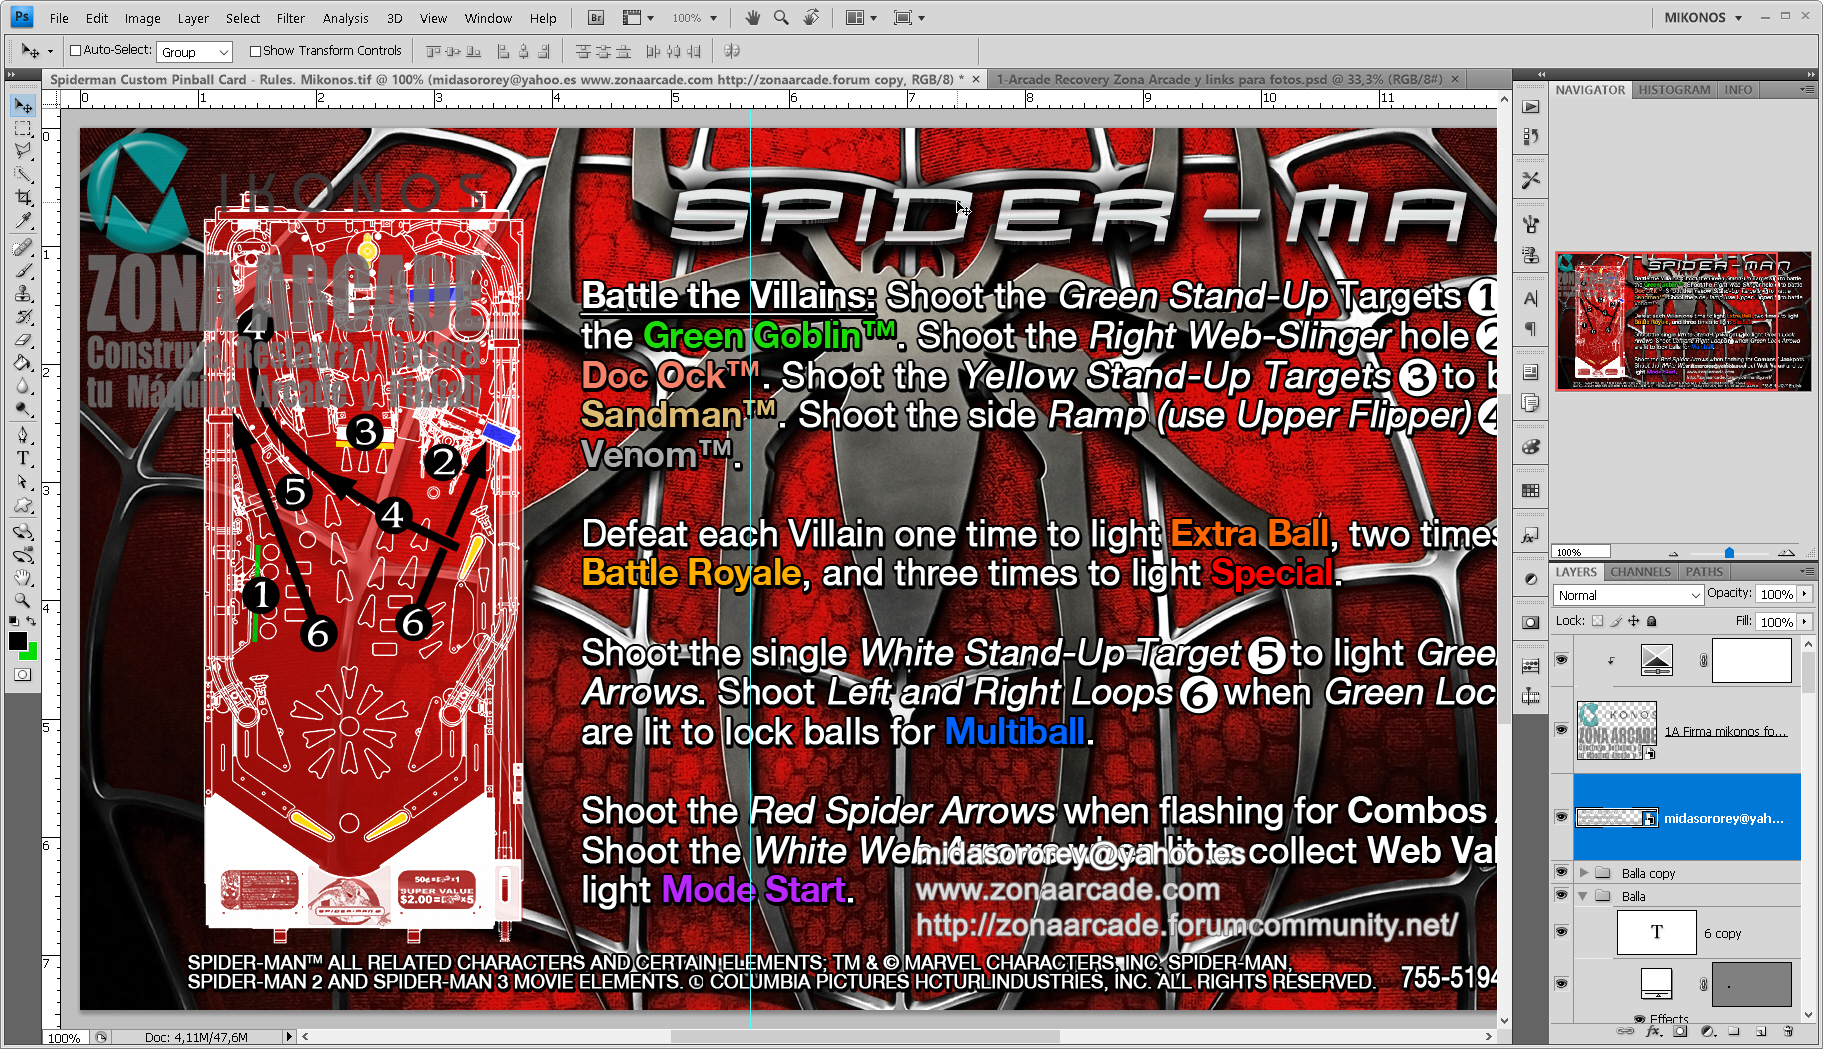 Spiderman%20Custom%20Pinball%20Card%20-%20Rules.%20Mikonos2.jpg